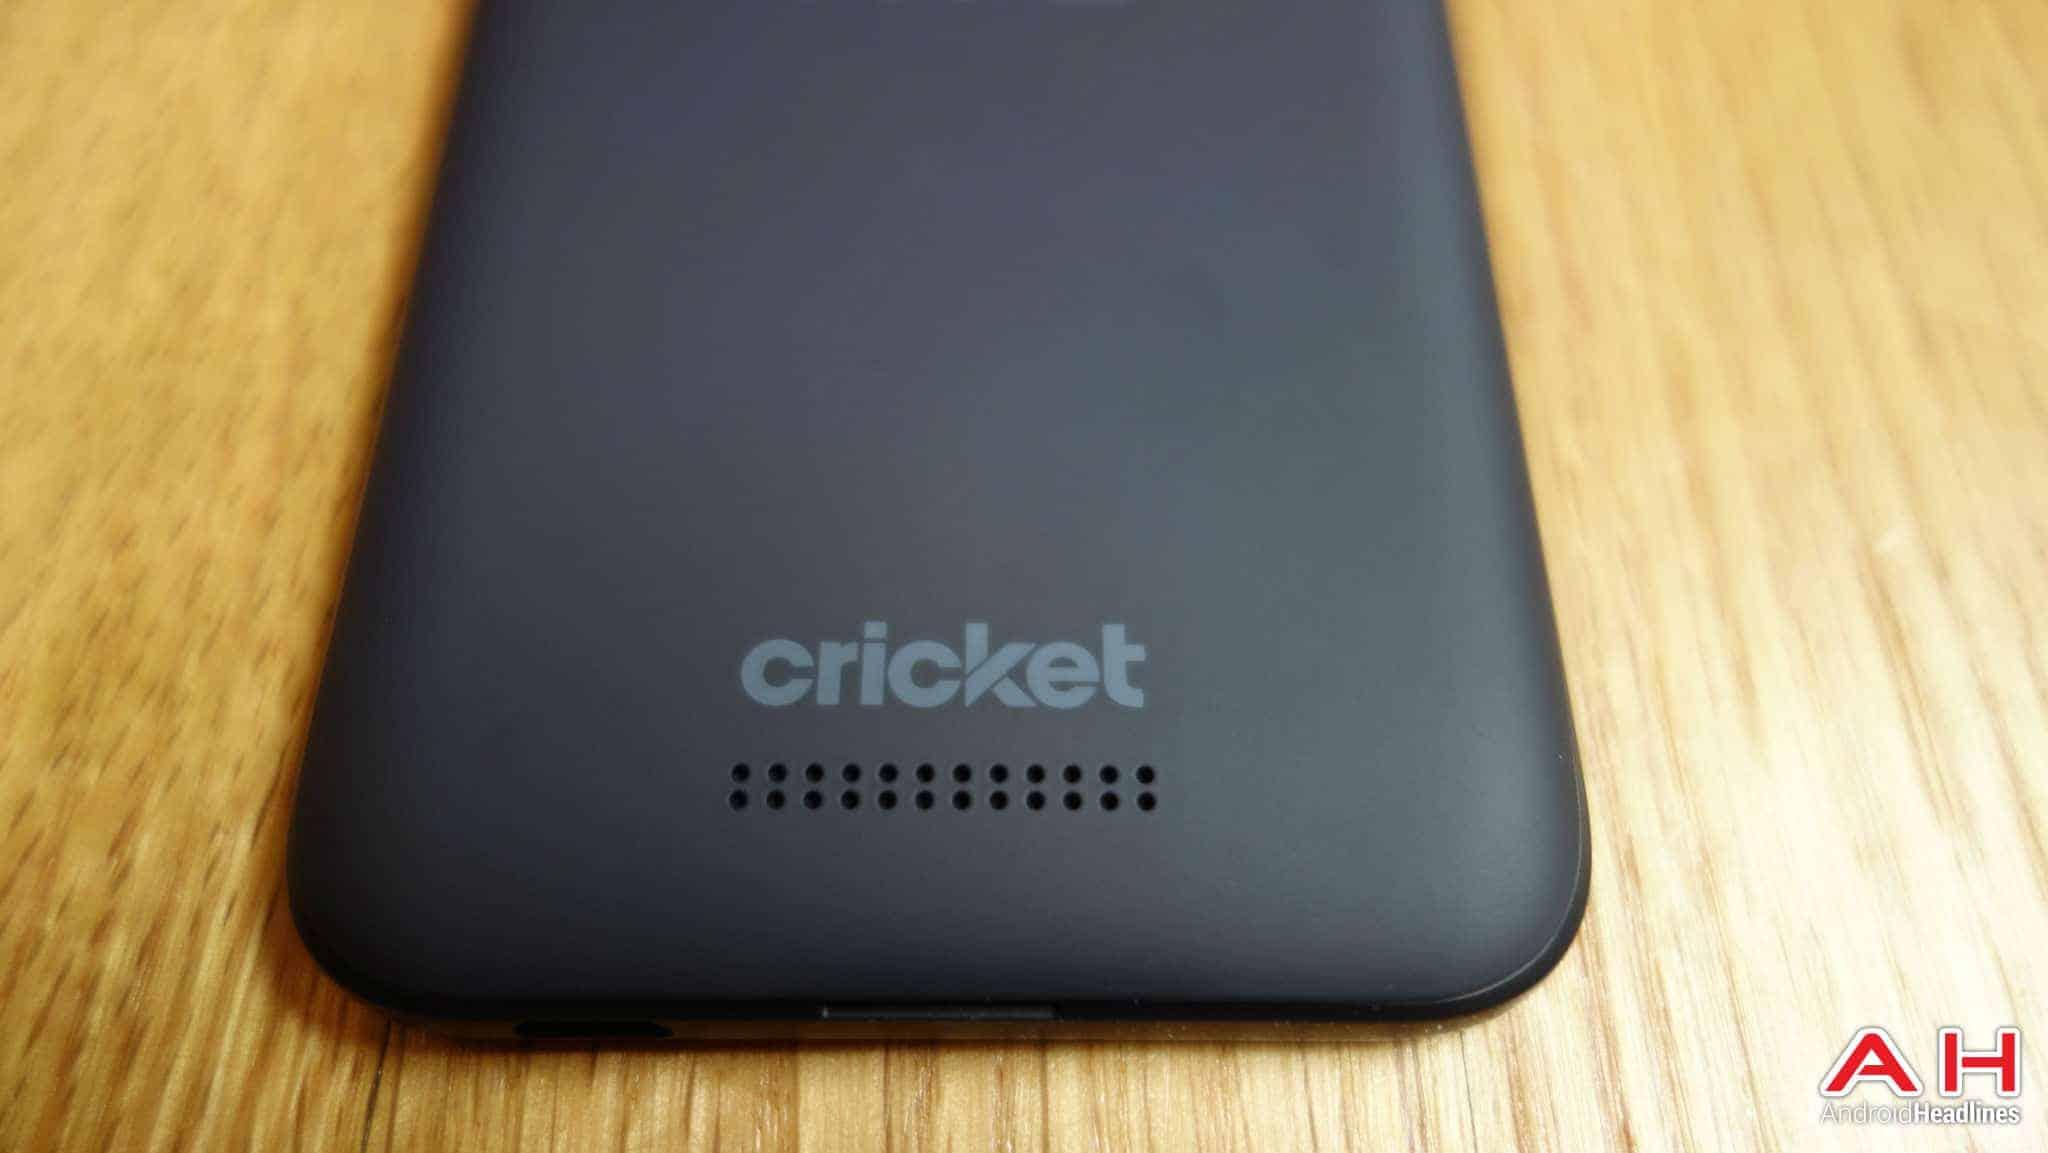 htc desire 510 cricket 3